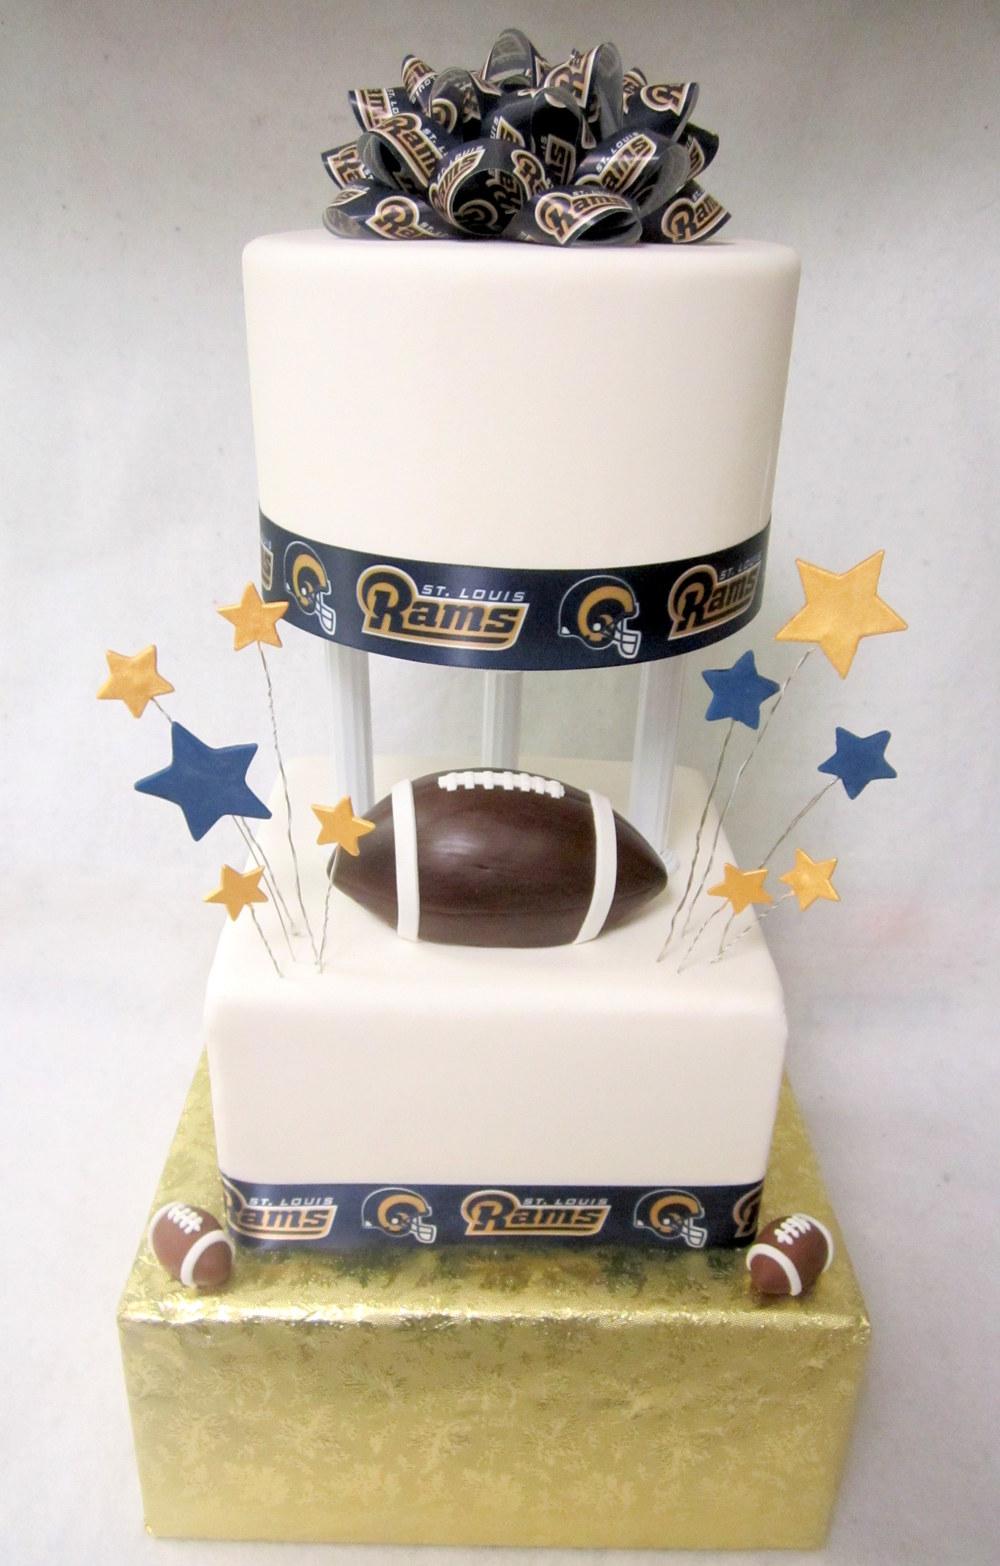 rams football tiered cake.jpg